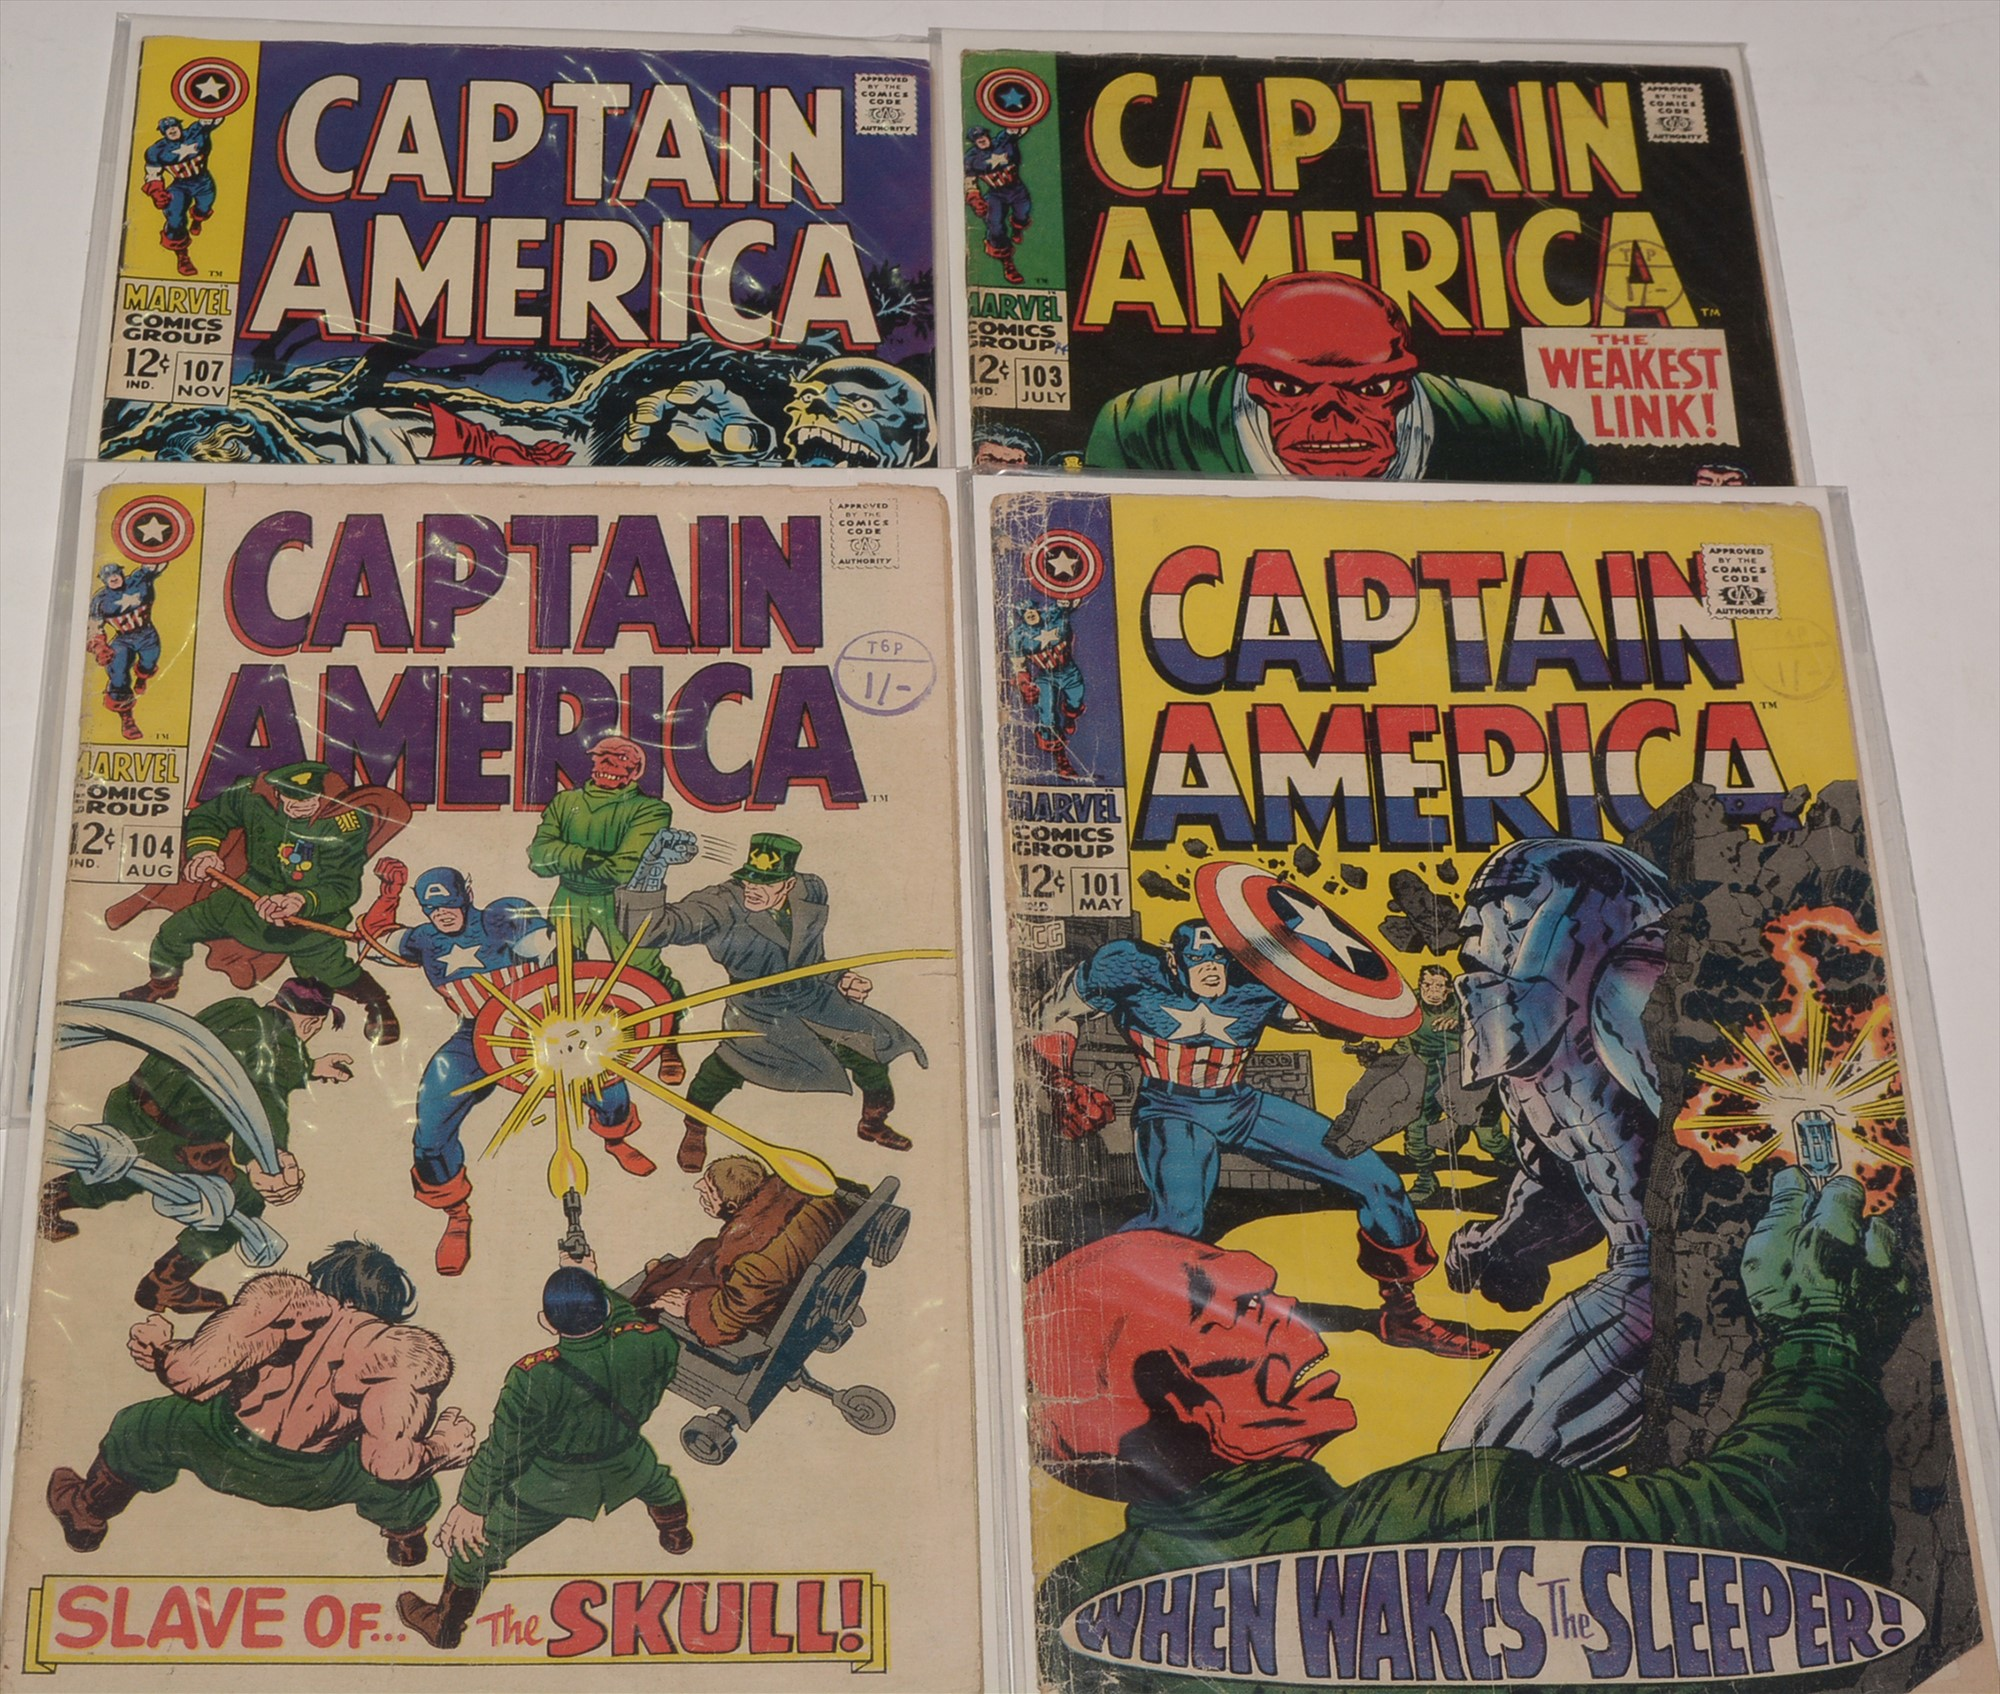 Captain America No. 101, 103, 104 and 107.